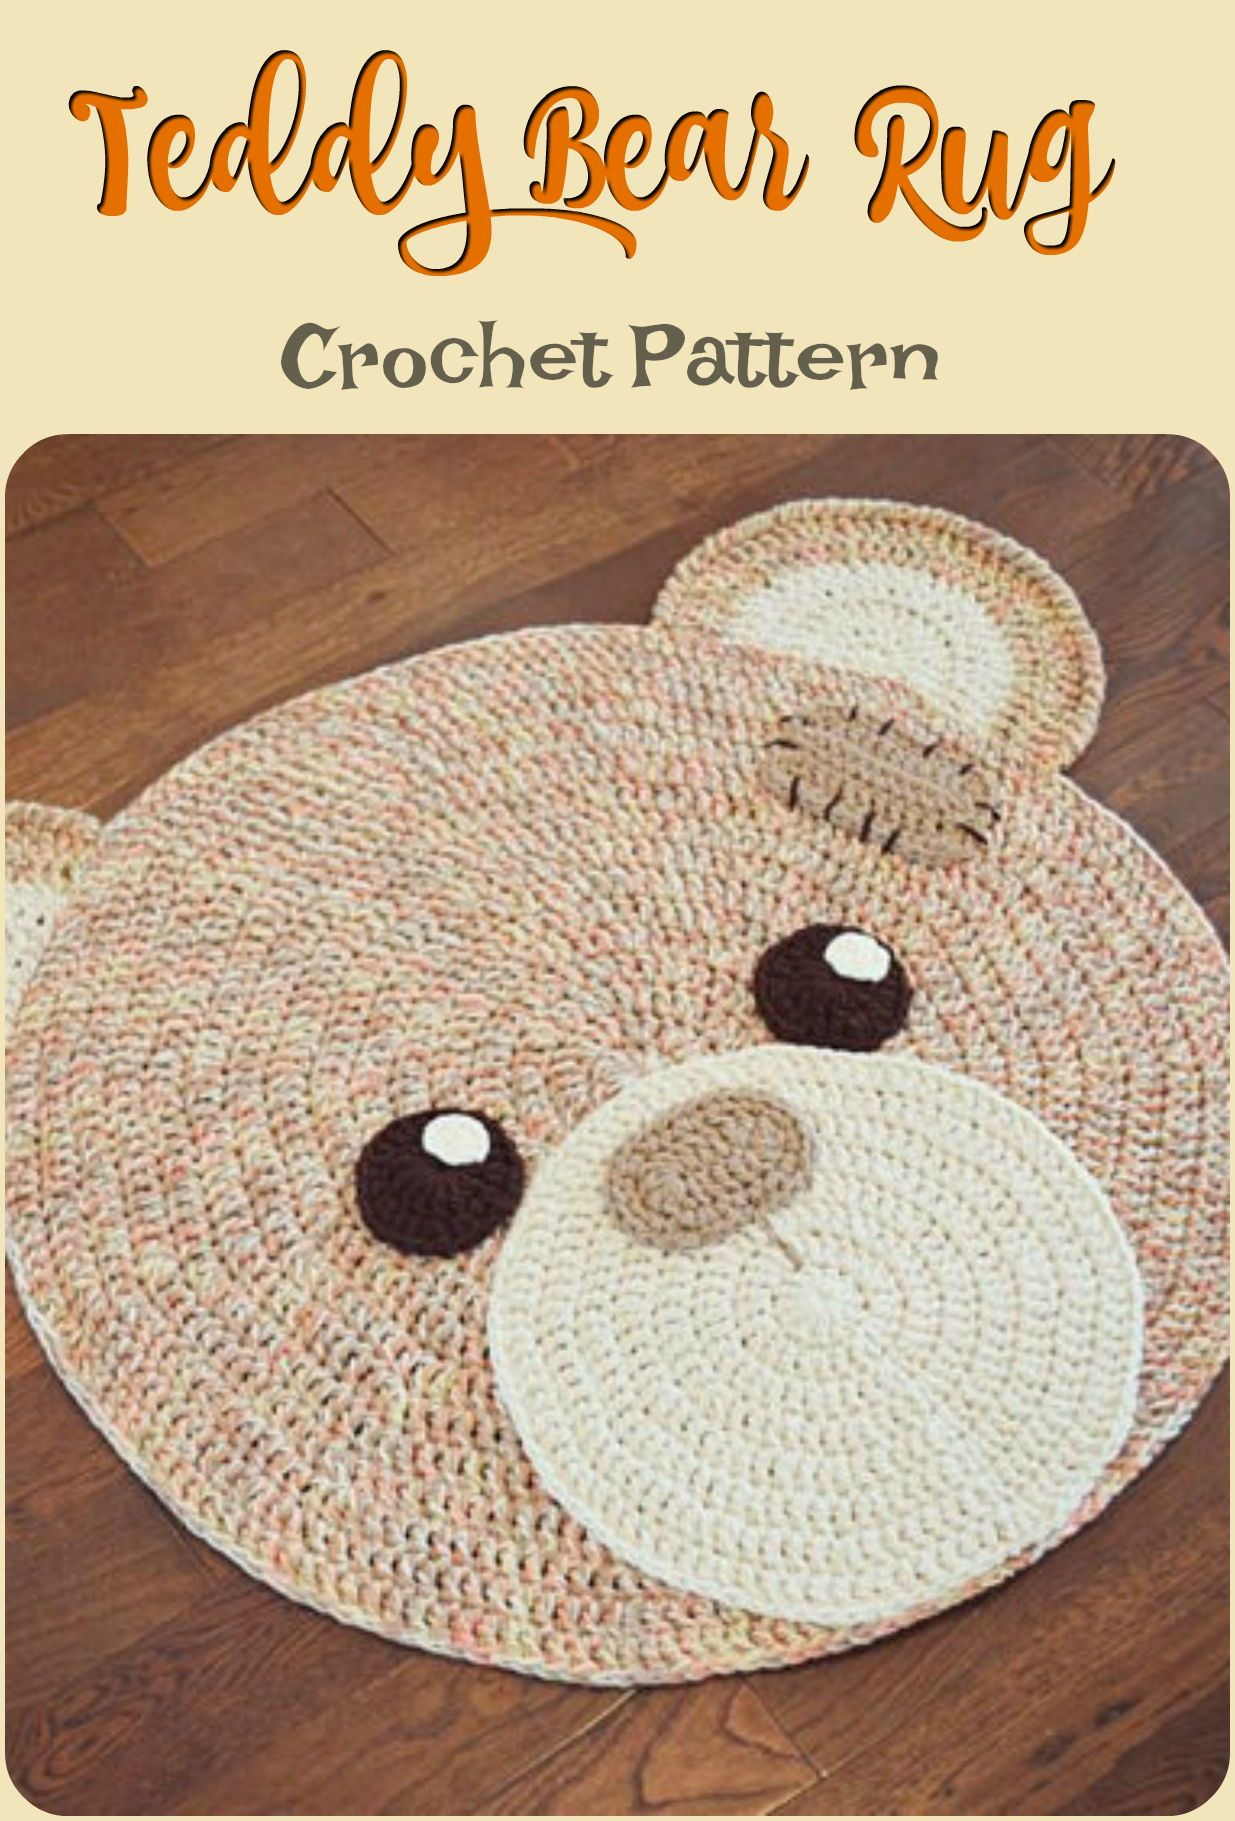 How Adorable Is This Teddy Bear Crochet